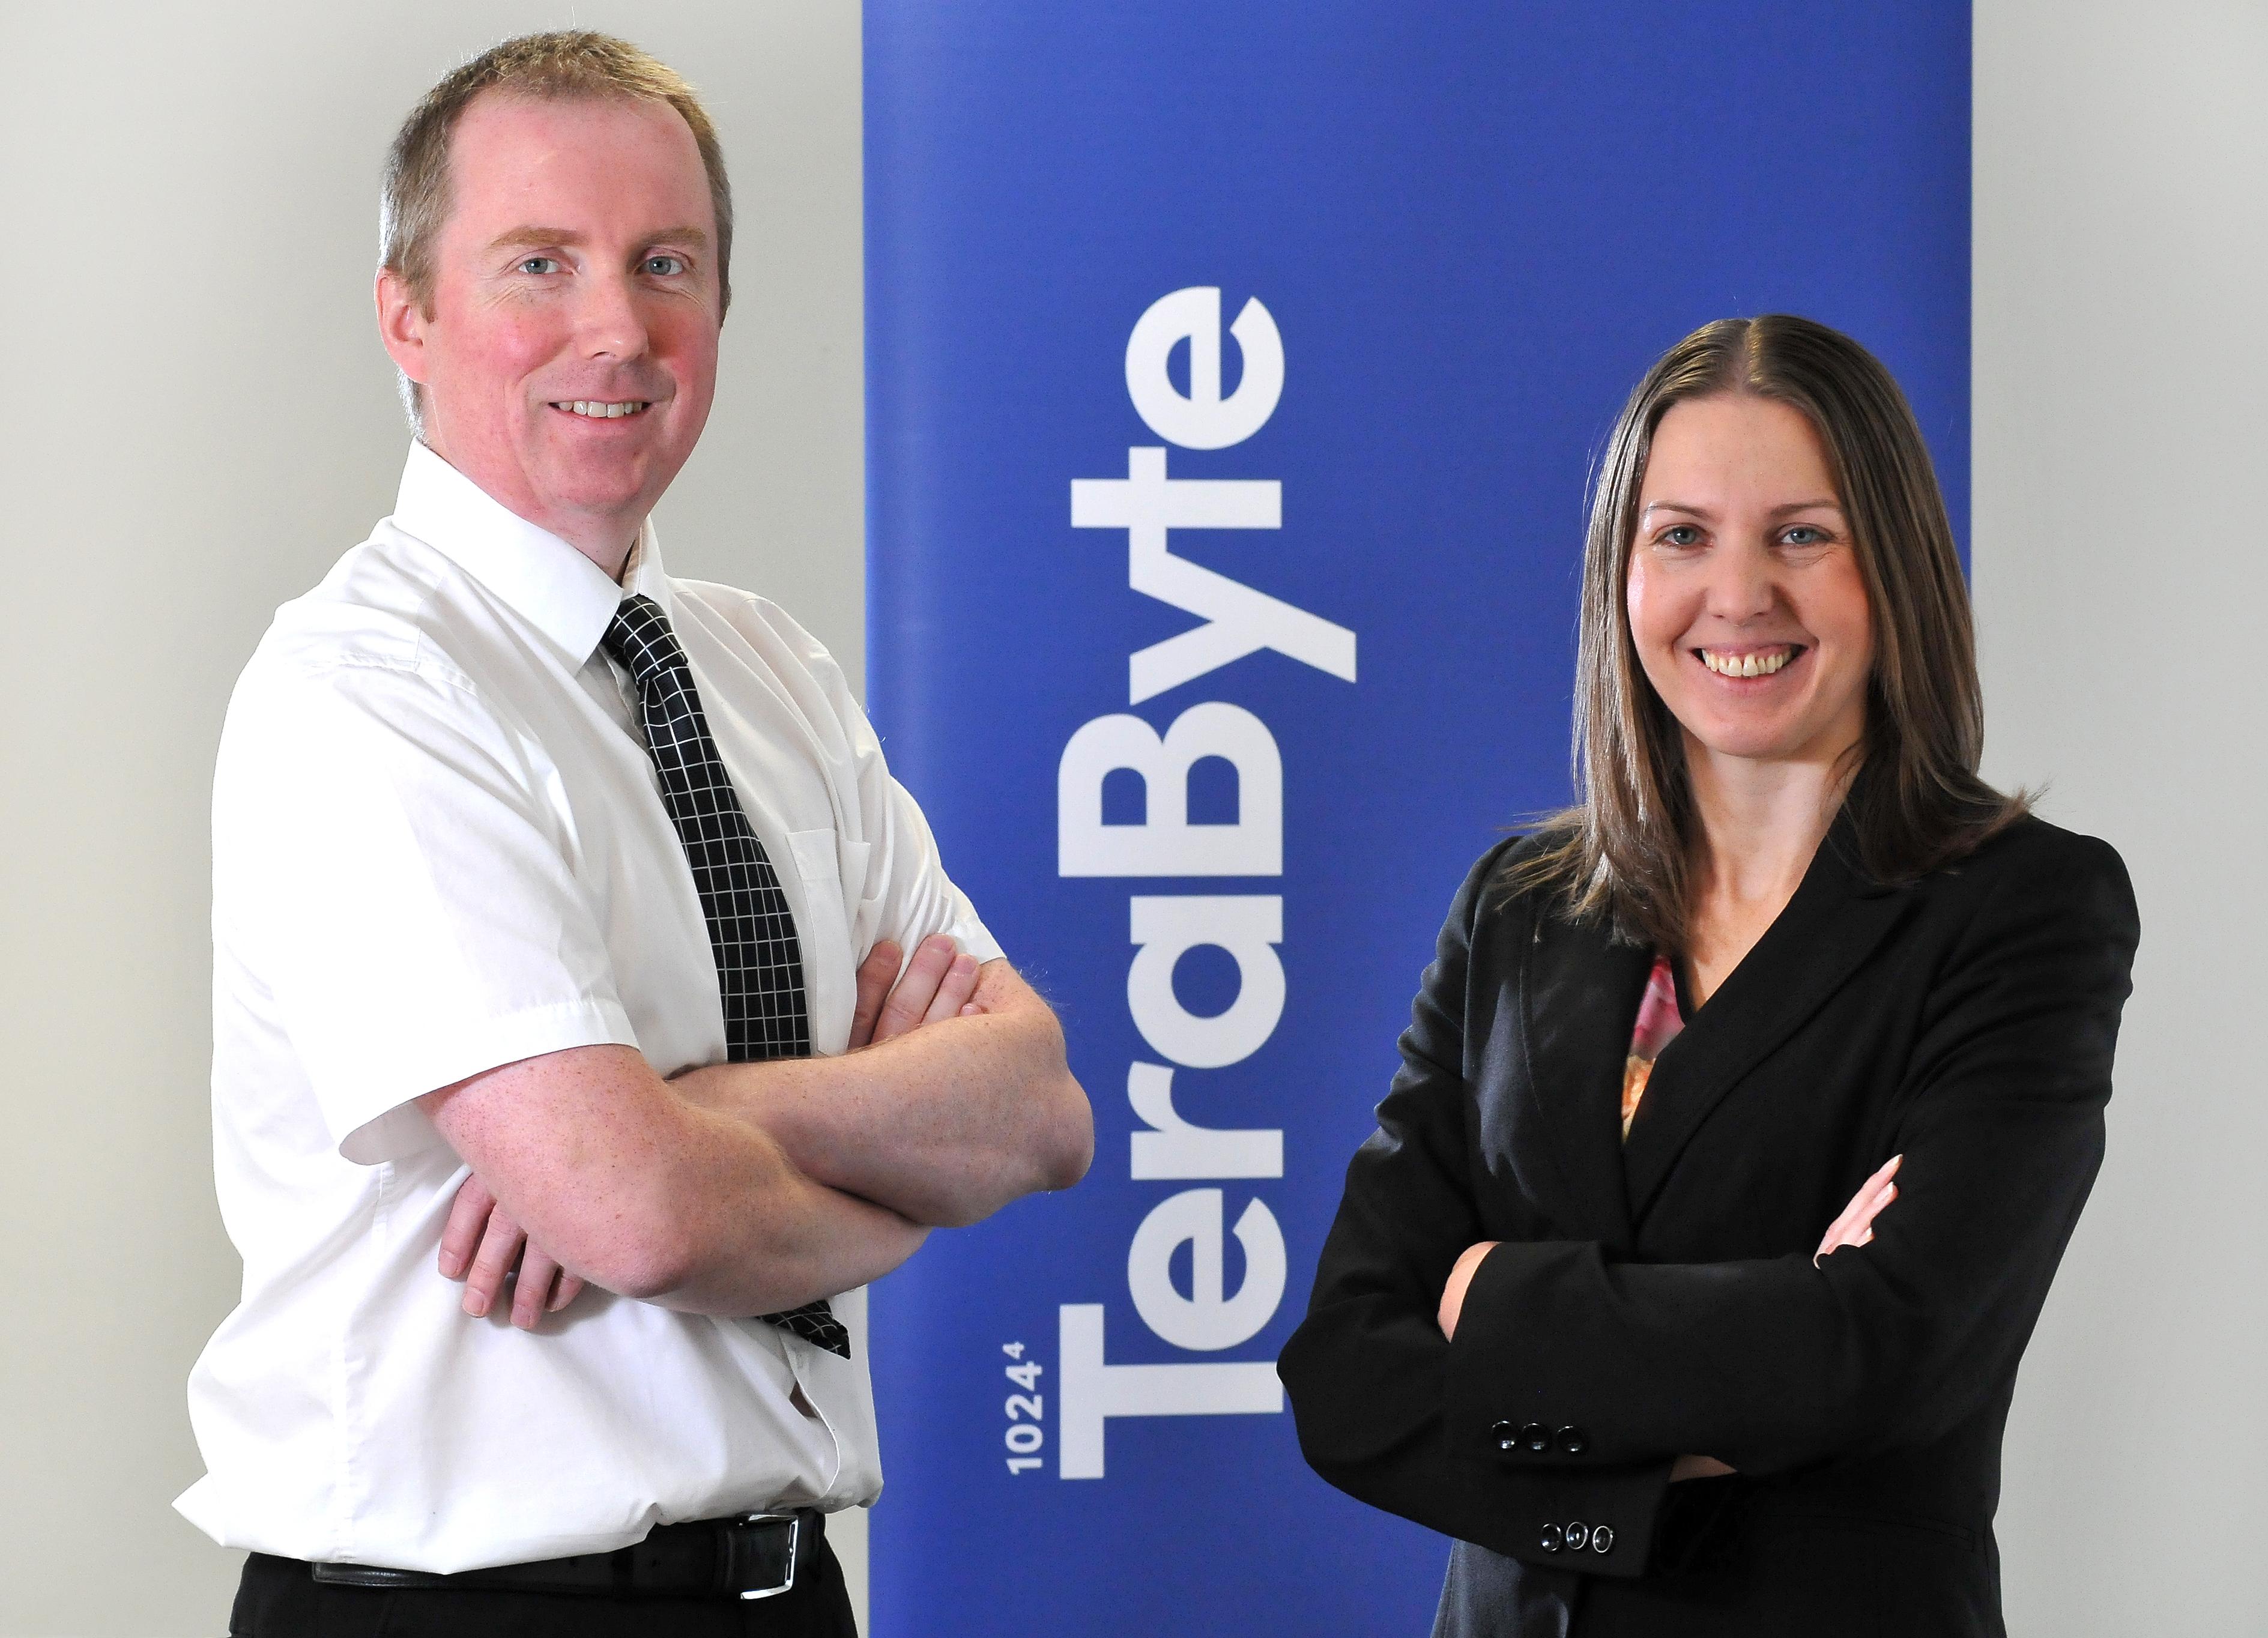 TeraByte Celebrates 5th Birthday Confirming New Partnership